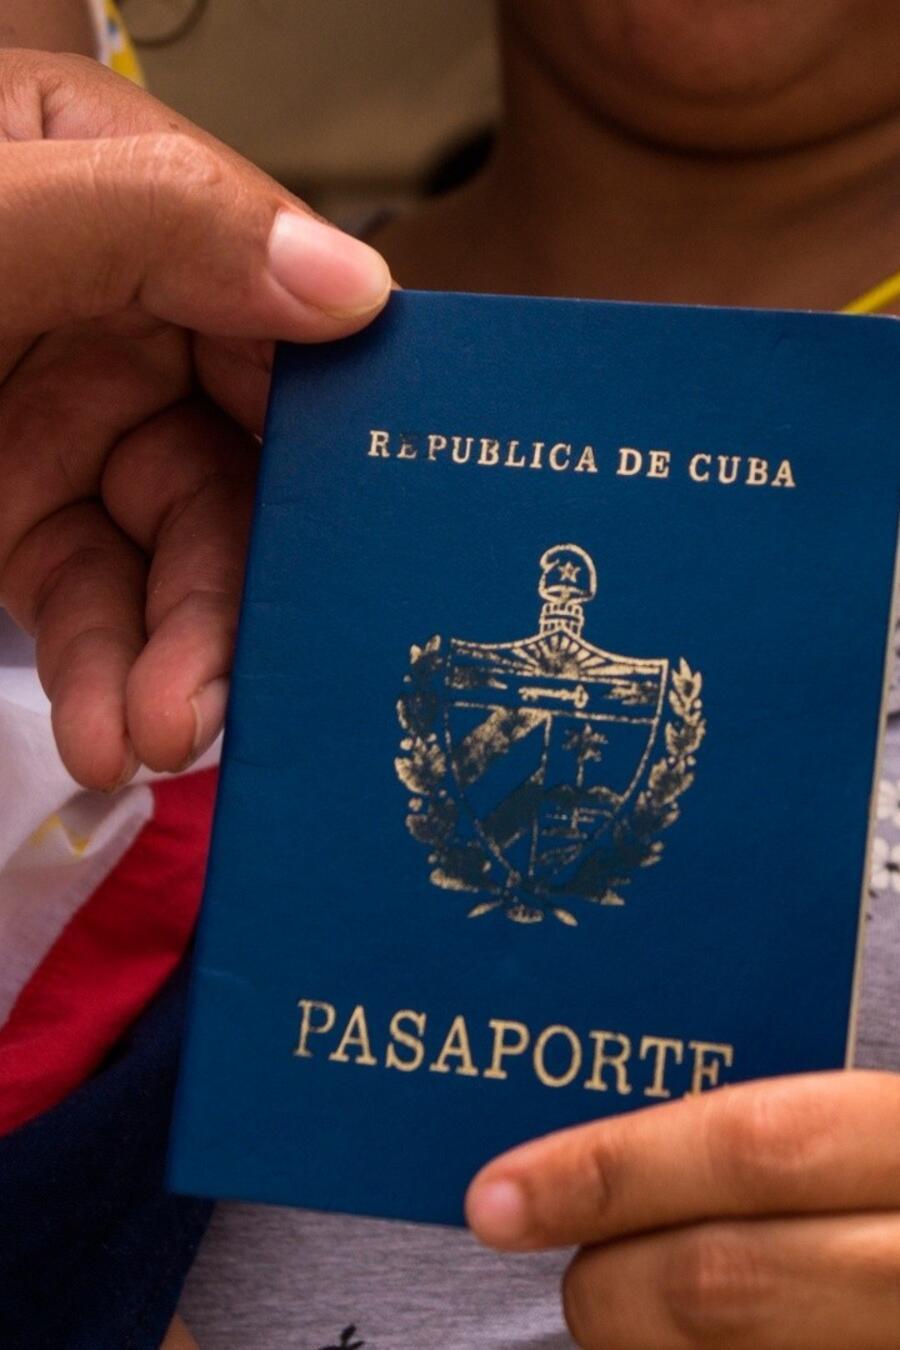 Pasaporte Cuba.jpg